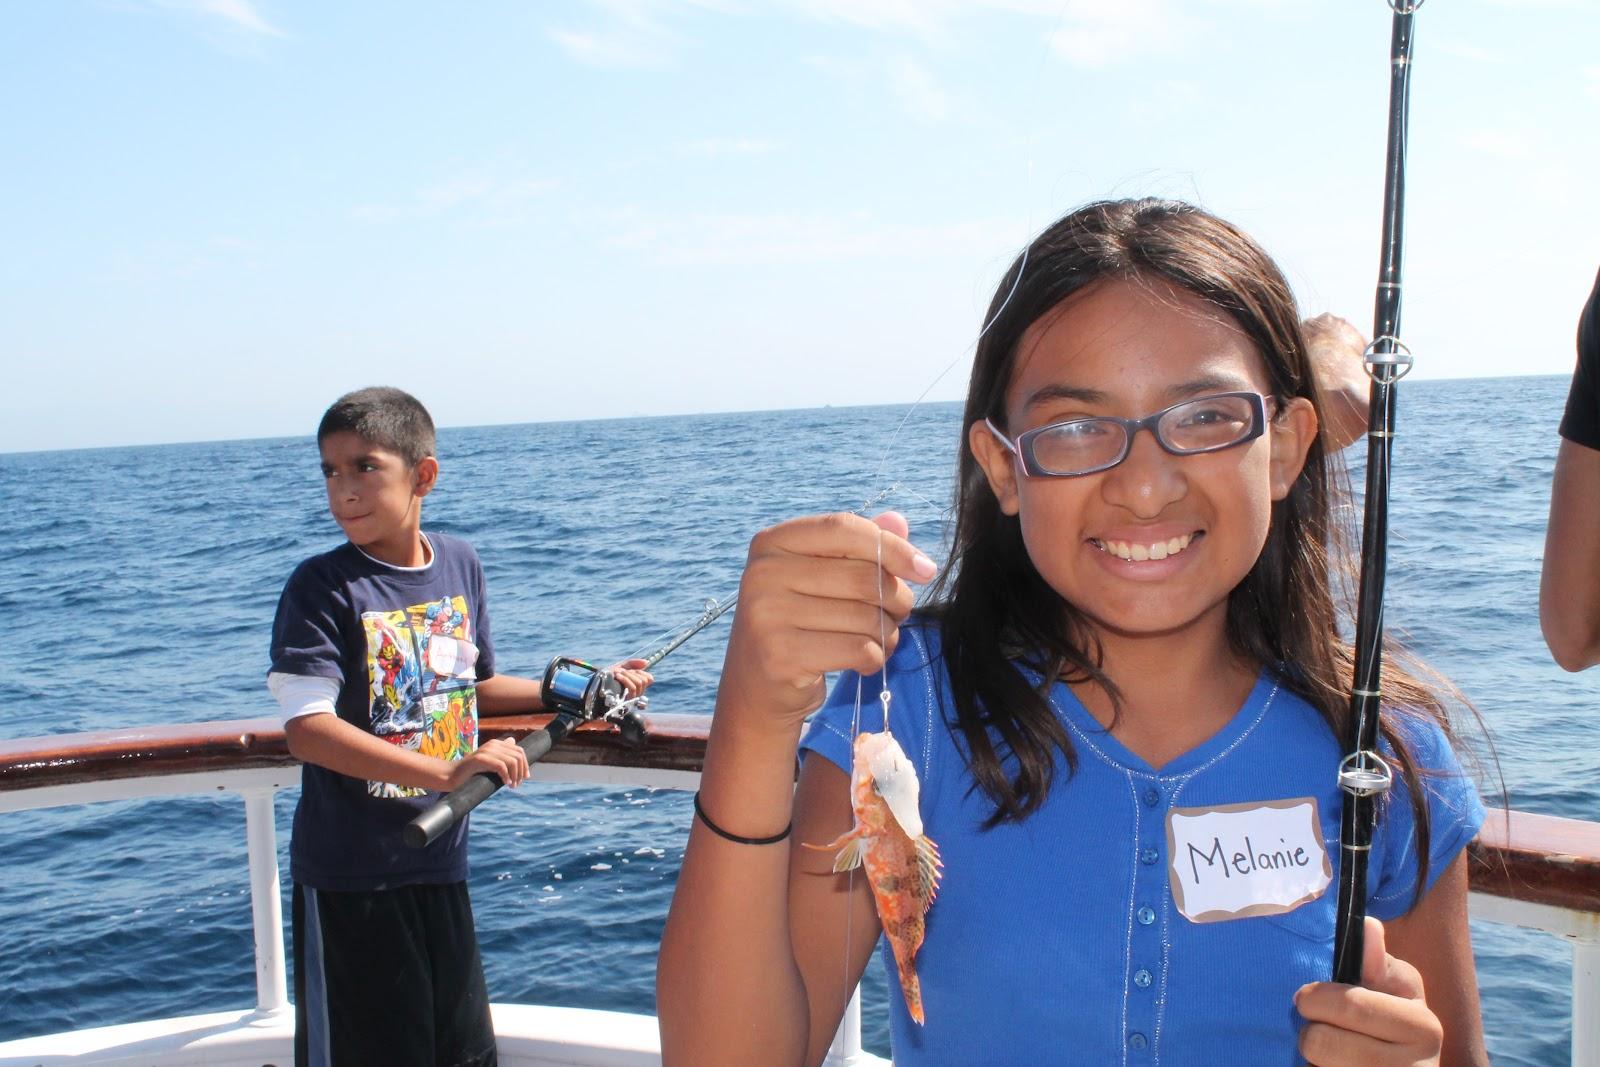 Dan 39 S Journal 85 Kids Go Ocean Fishing For The Very First